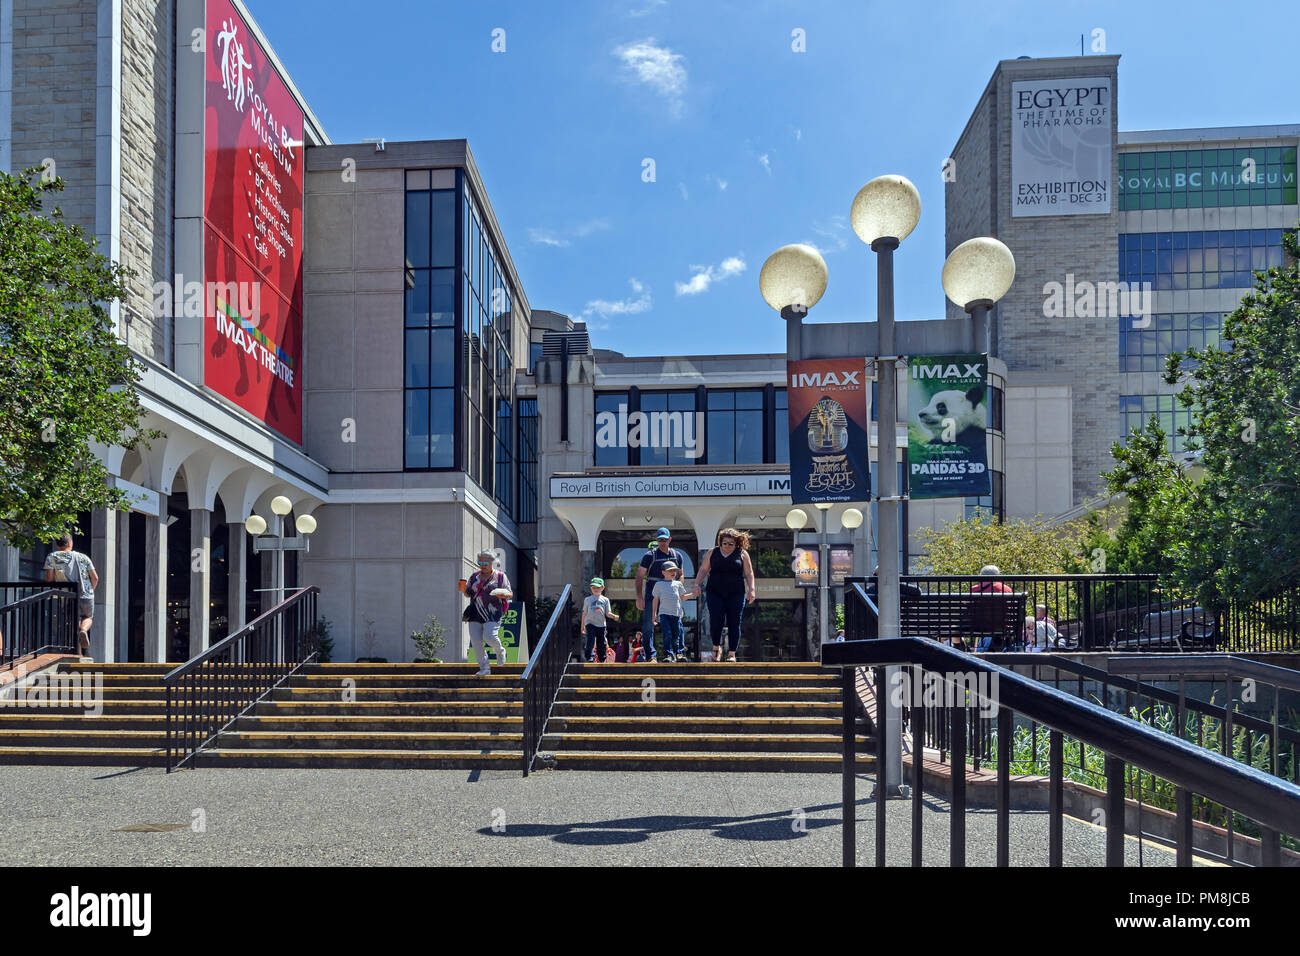 Royal British Columbia Museum, Victoria, capital of British Columbia, Canada - Stock Image